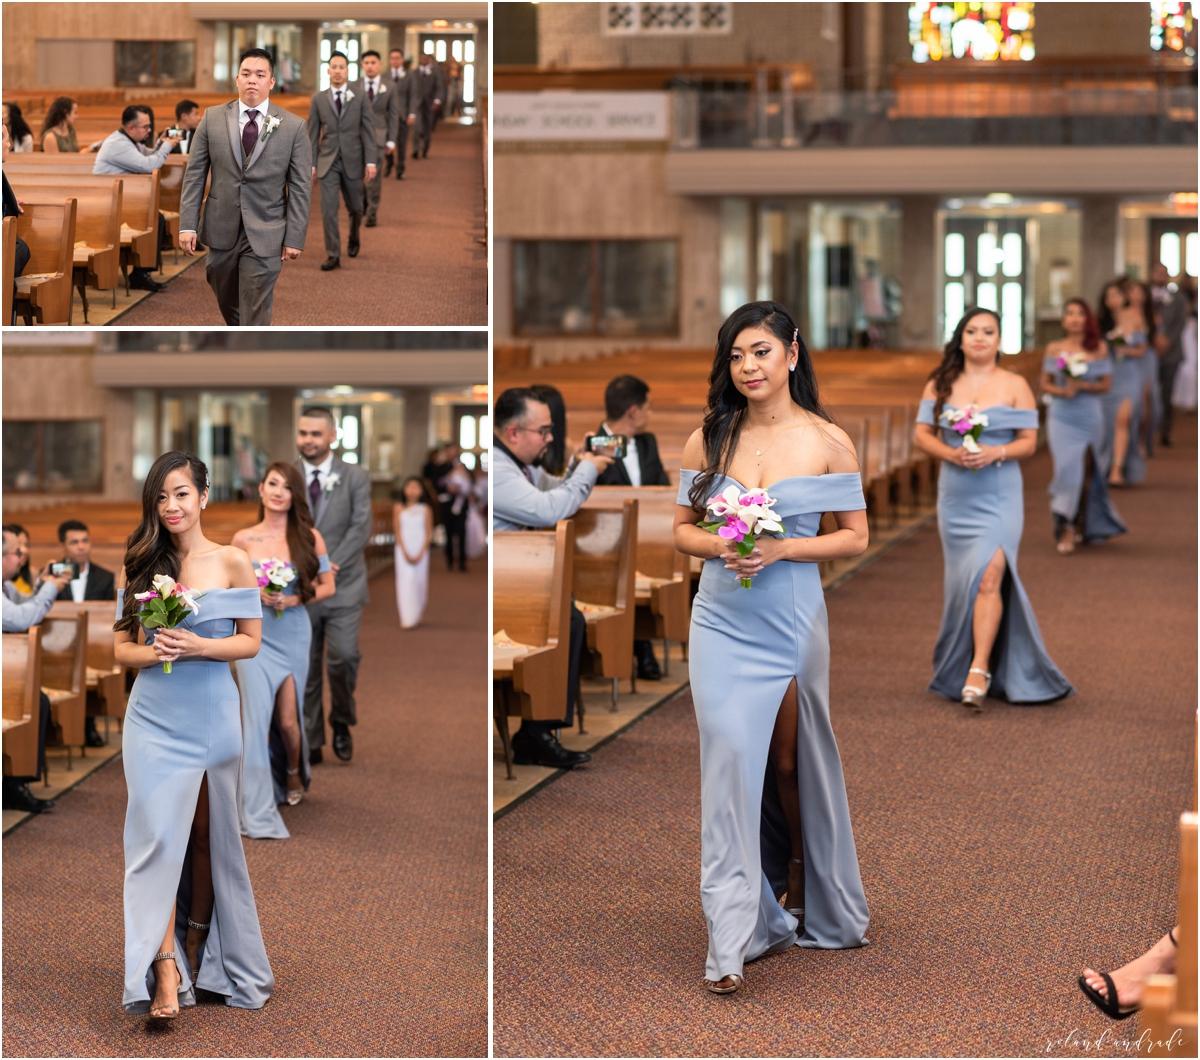 Meridian Banquets Wedding, Rolling Meadows Illinois Wedding, Chicago Wedding Photographer, Aurora Wedding Photographer, Best Photographer In Aurora, Best Photographer In Chicago_0046.jpg